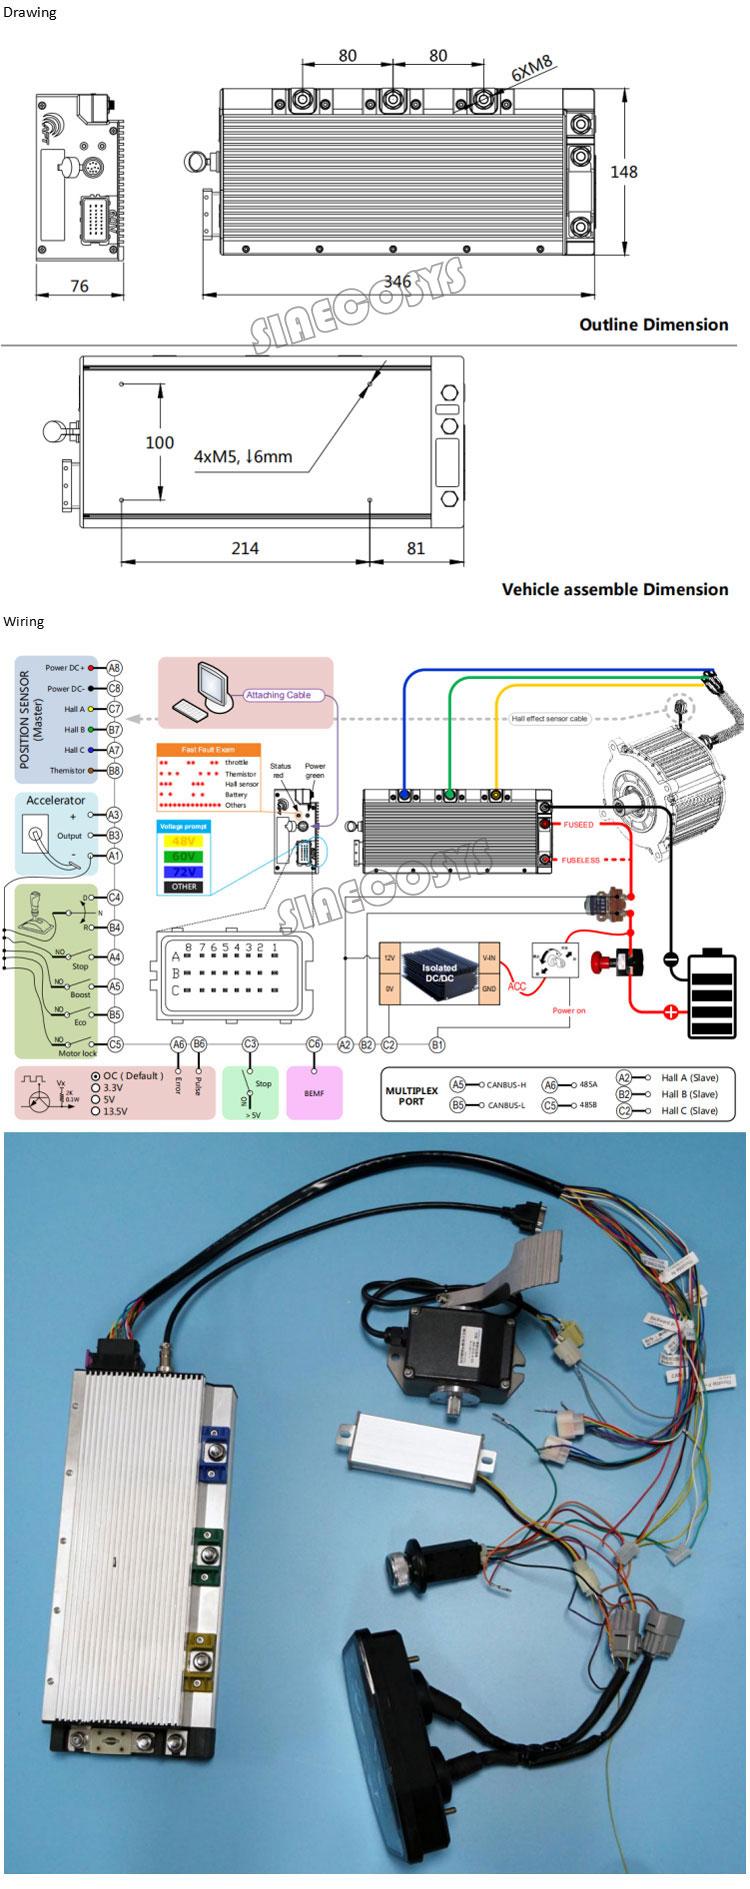 X8 Motor Wiring Diagram - Alpine Subwoofer Wiring Diagram -  deviille.1997wir.jeanjaures37.fr   X8 Motor Wiring Diagram      Wiring Diagram - Wiring Diagram Resource